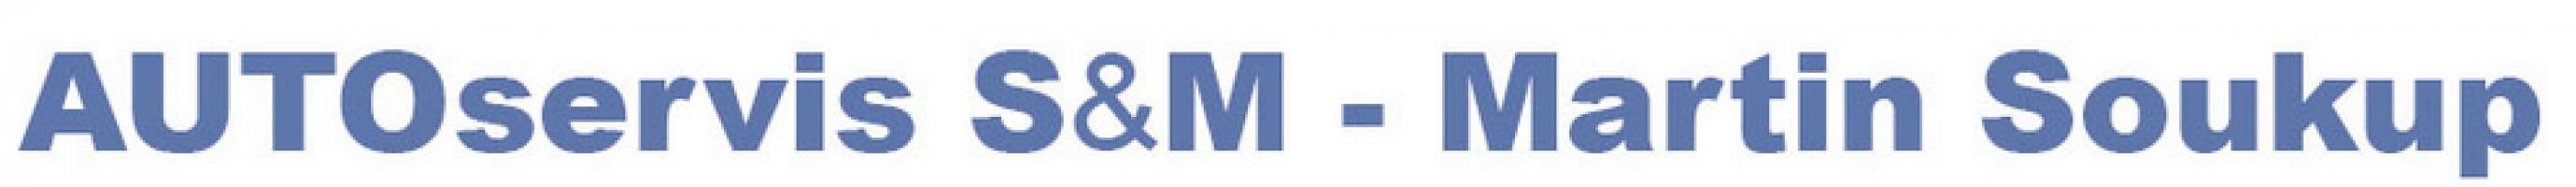 Logo firmy: Martin Soukup - autoservis S&M